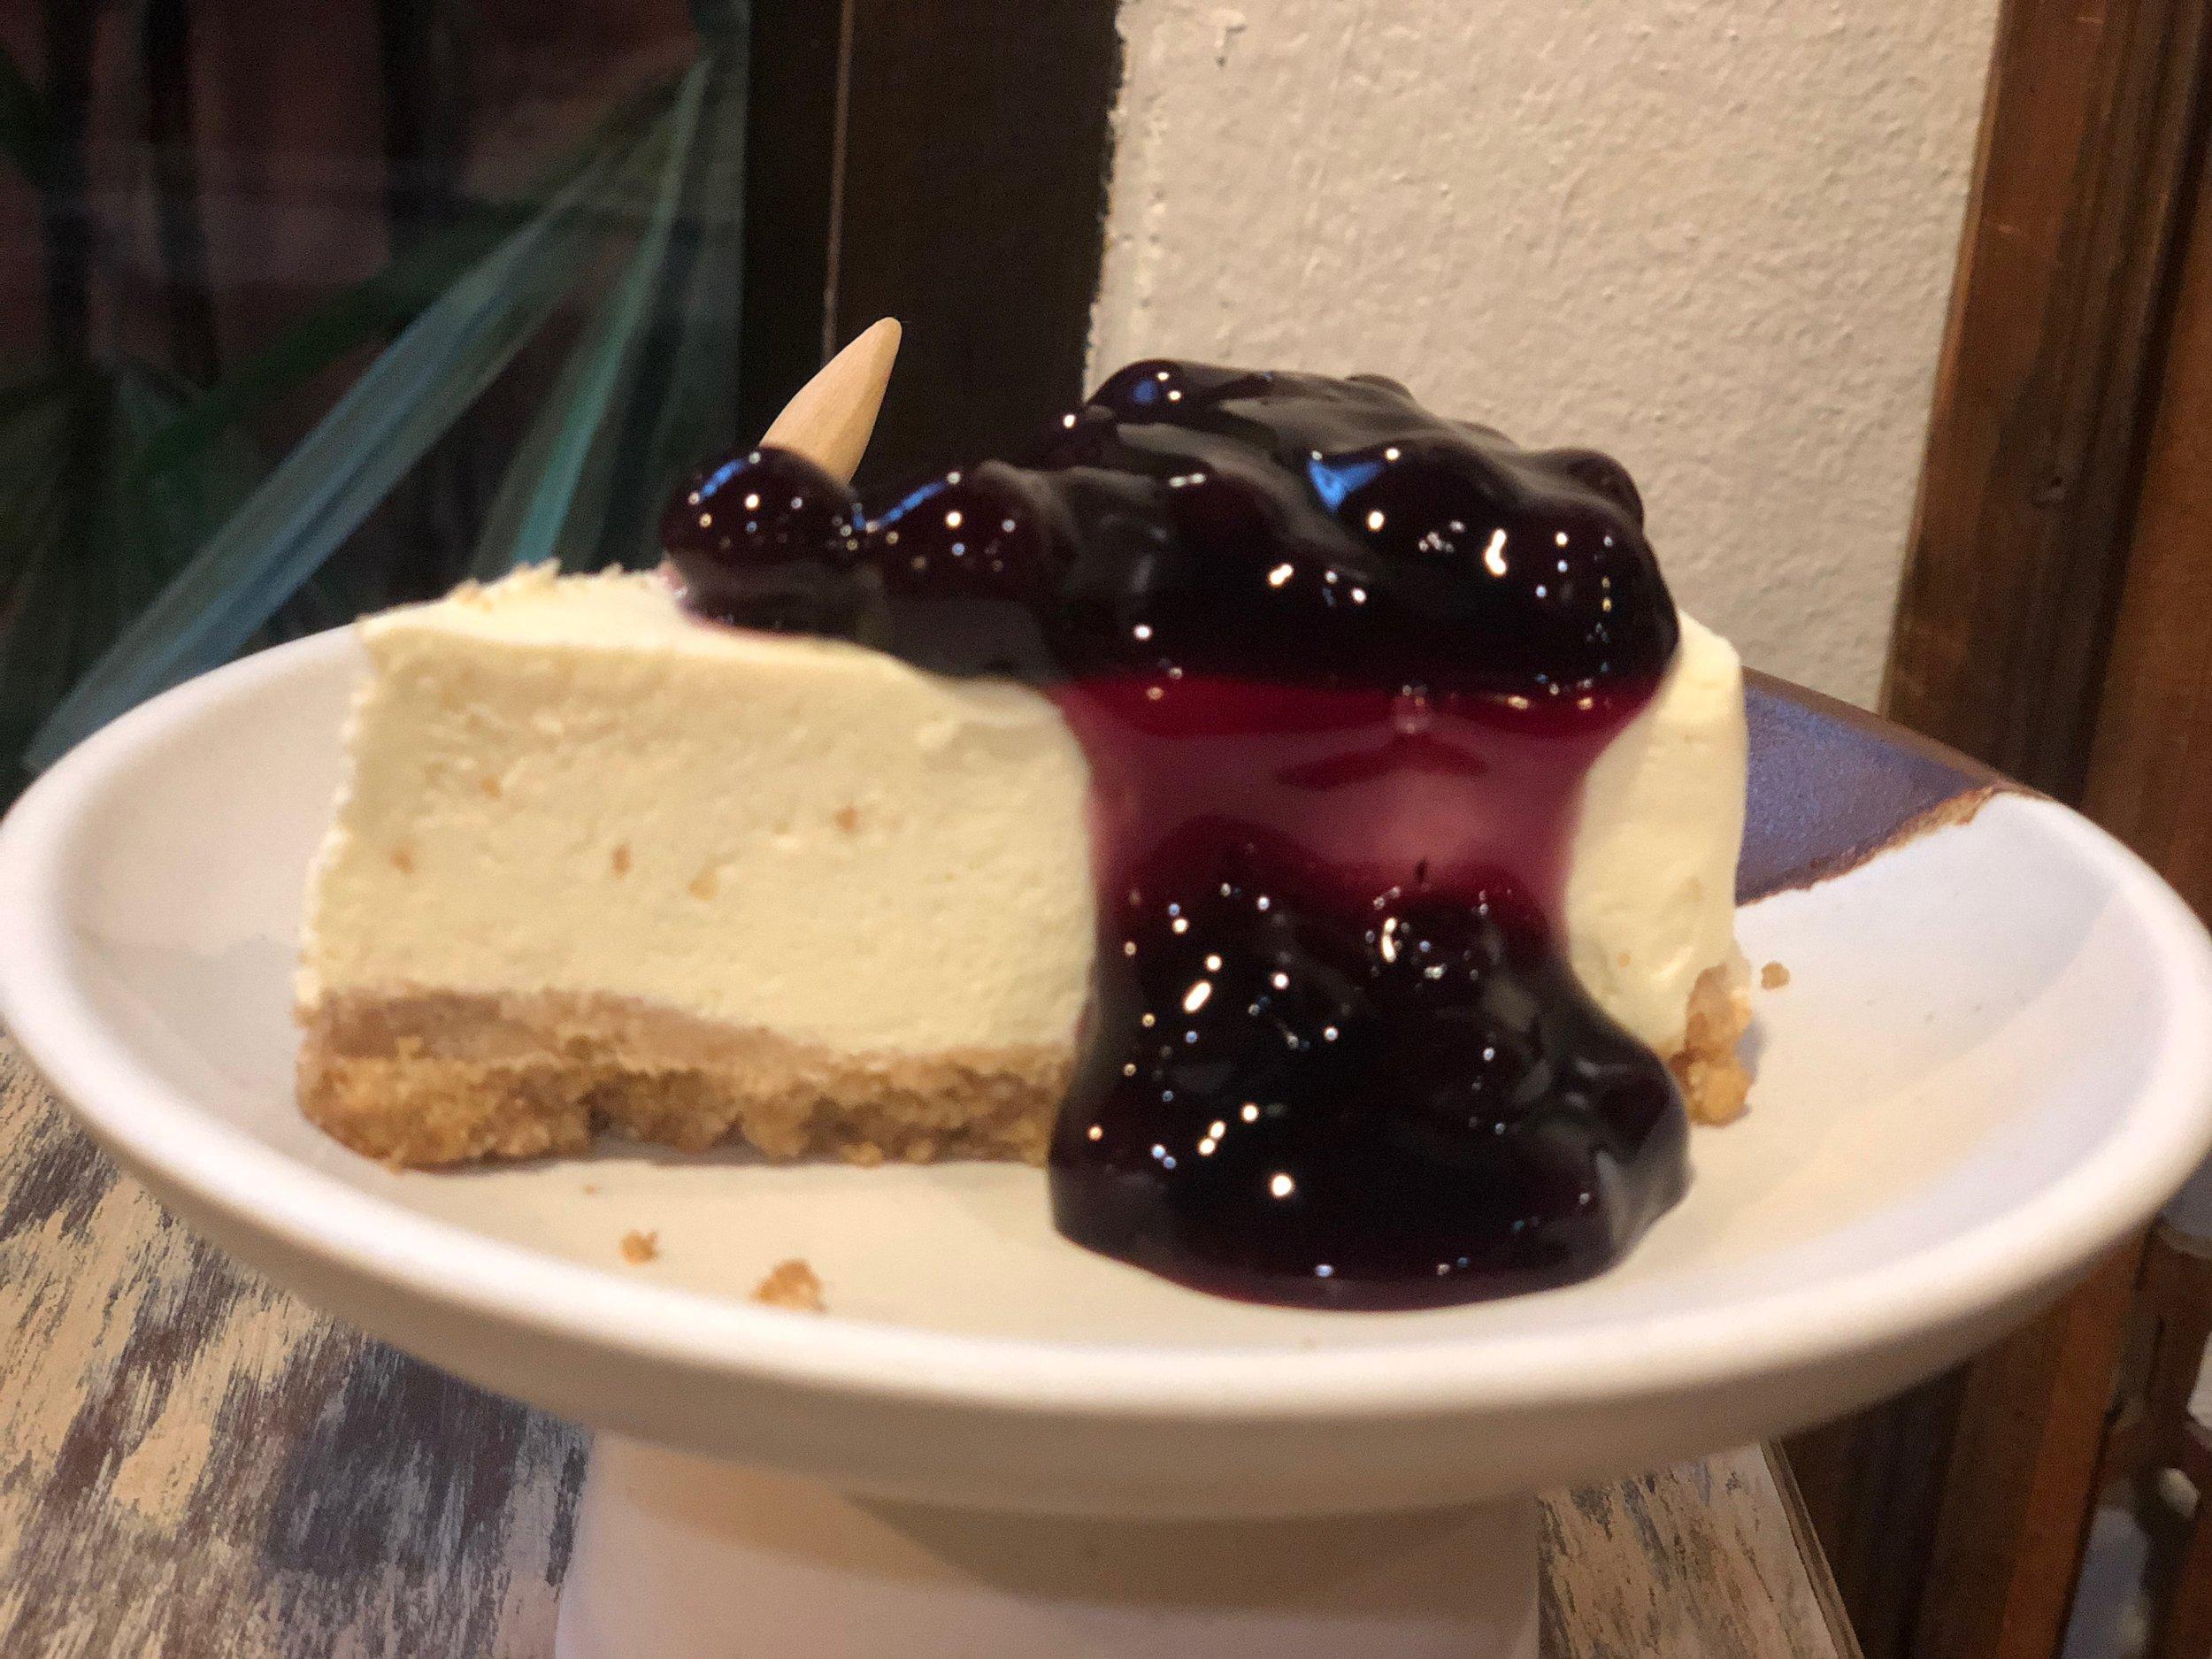 samui_health_shop_yogurt_cheese_pie.jpg